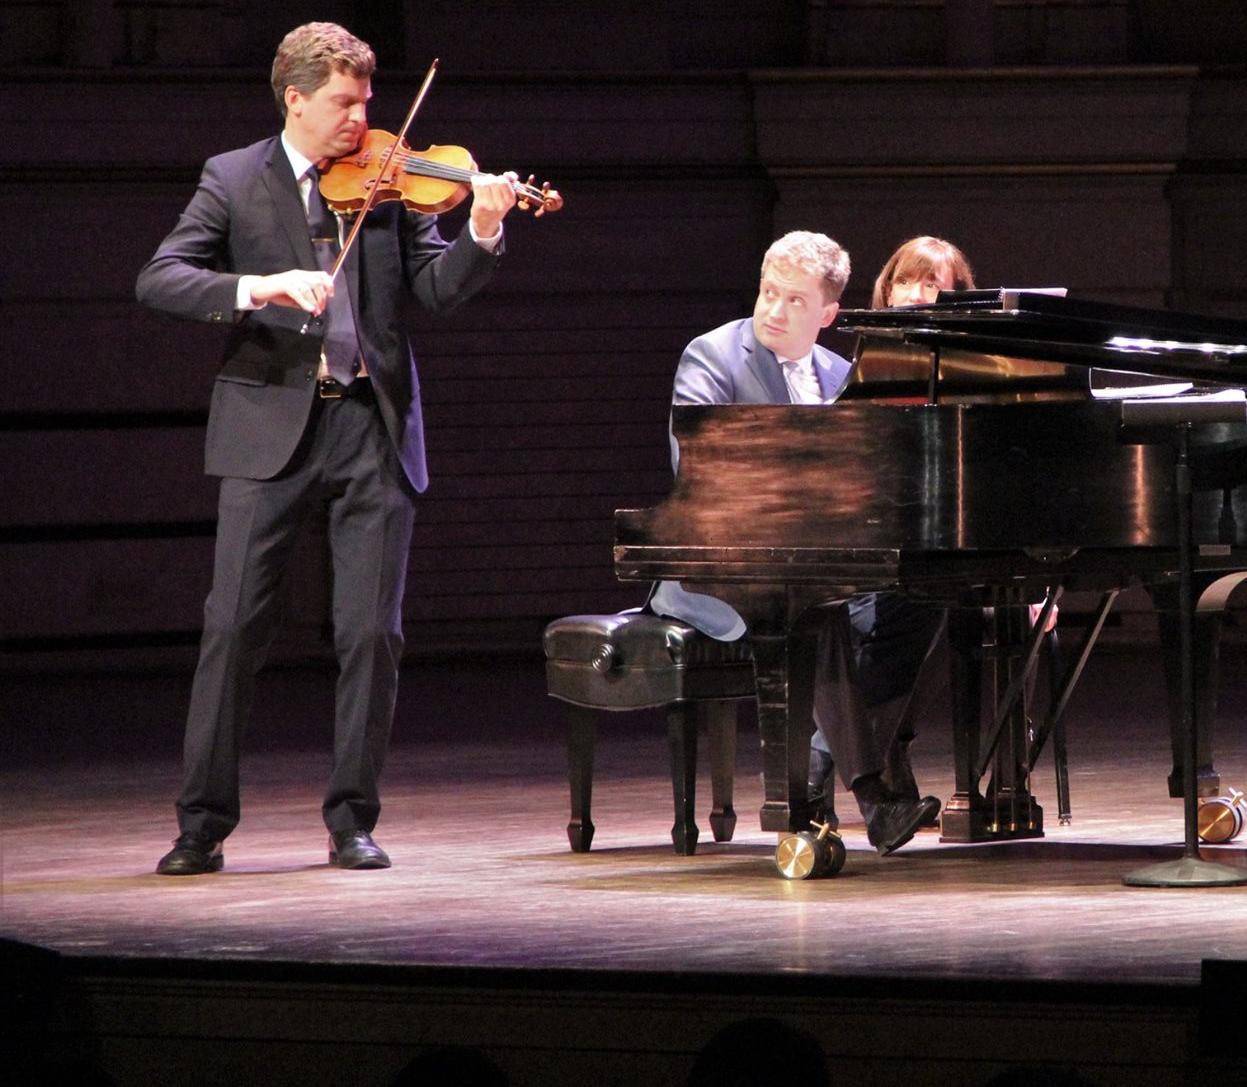 Photos courtesy of Vancouver Symphony.